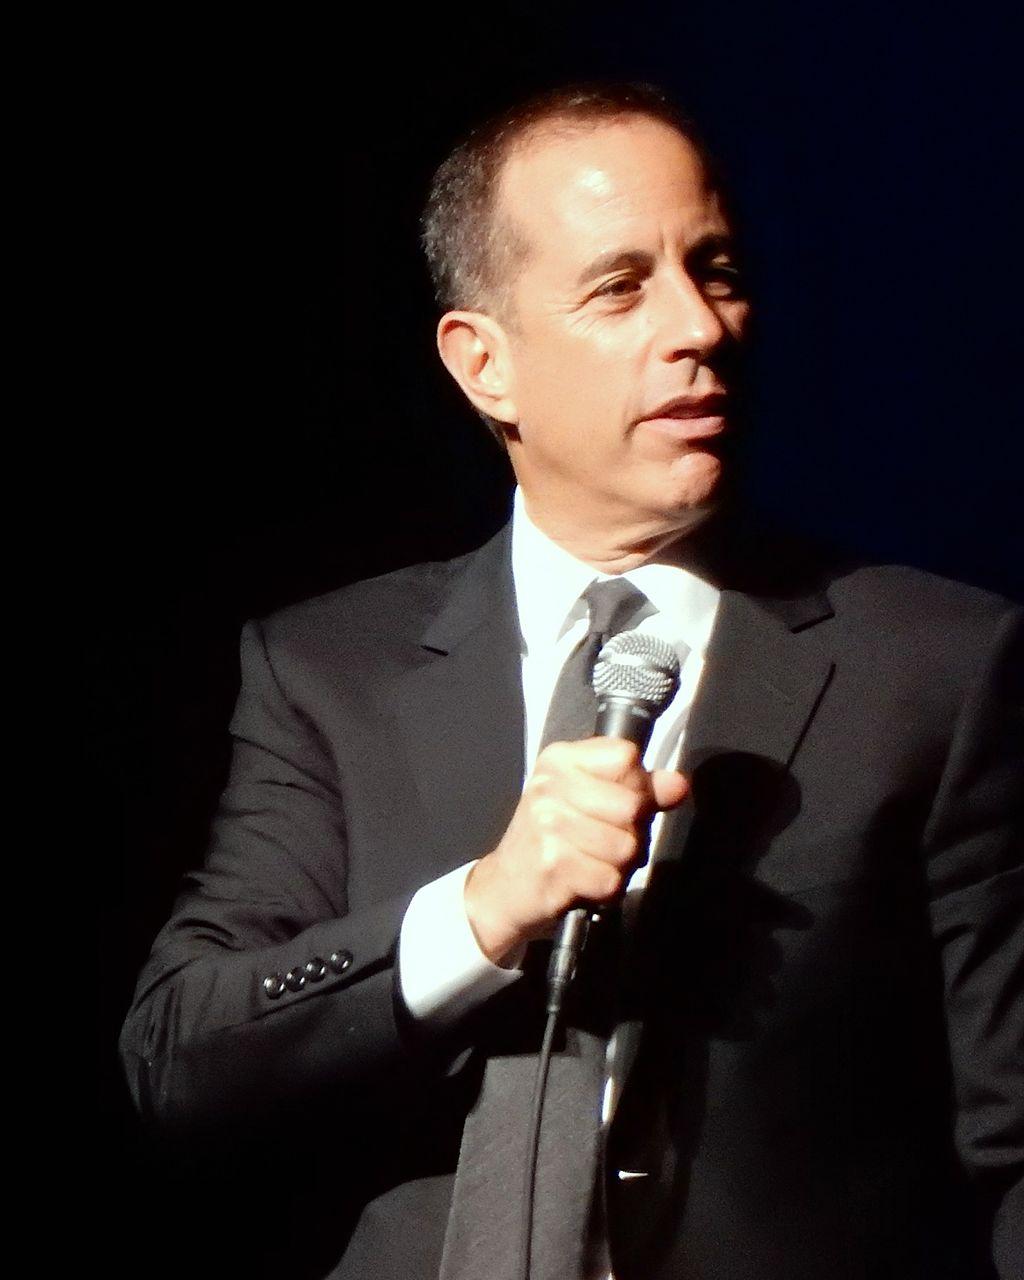 Jerry Seinfeld Autistic